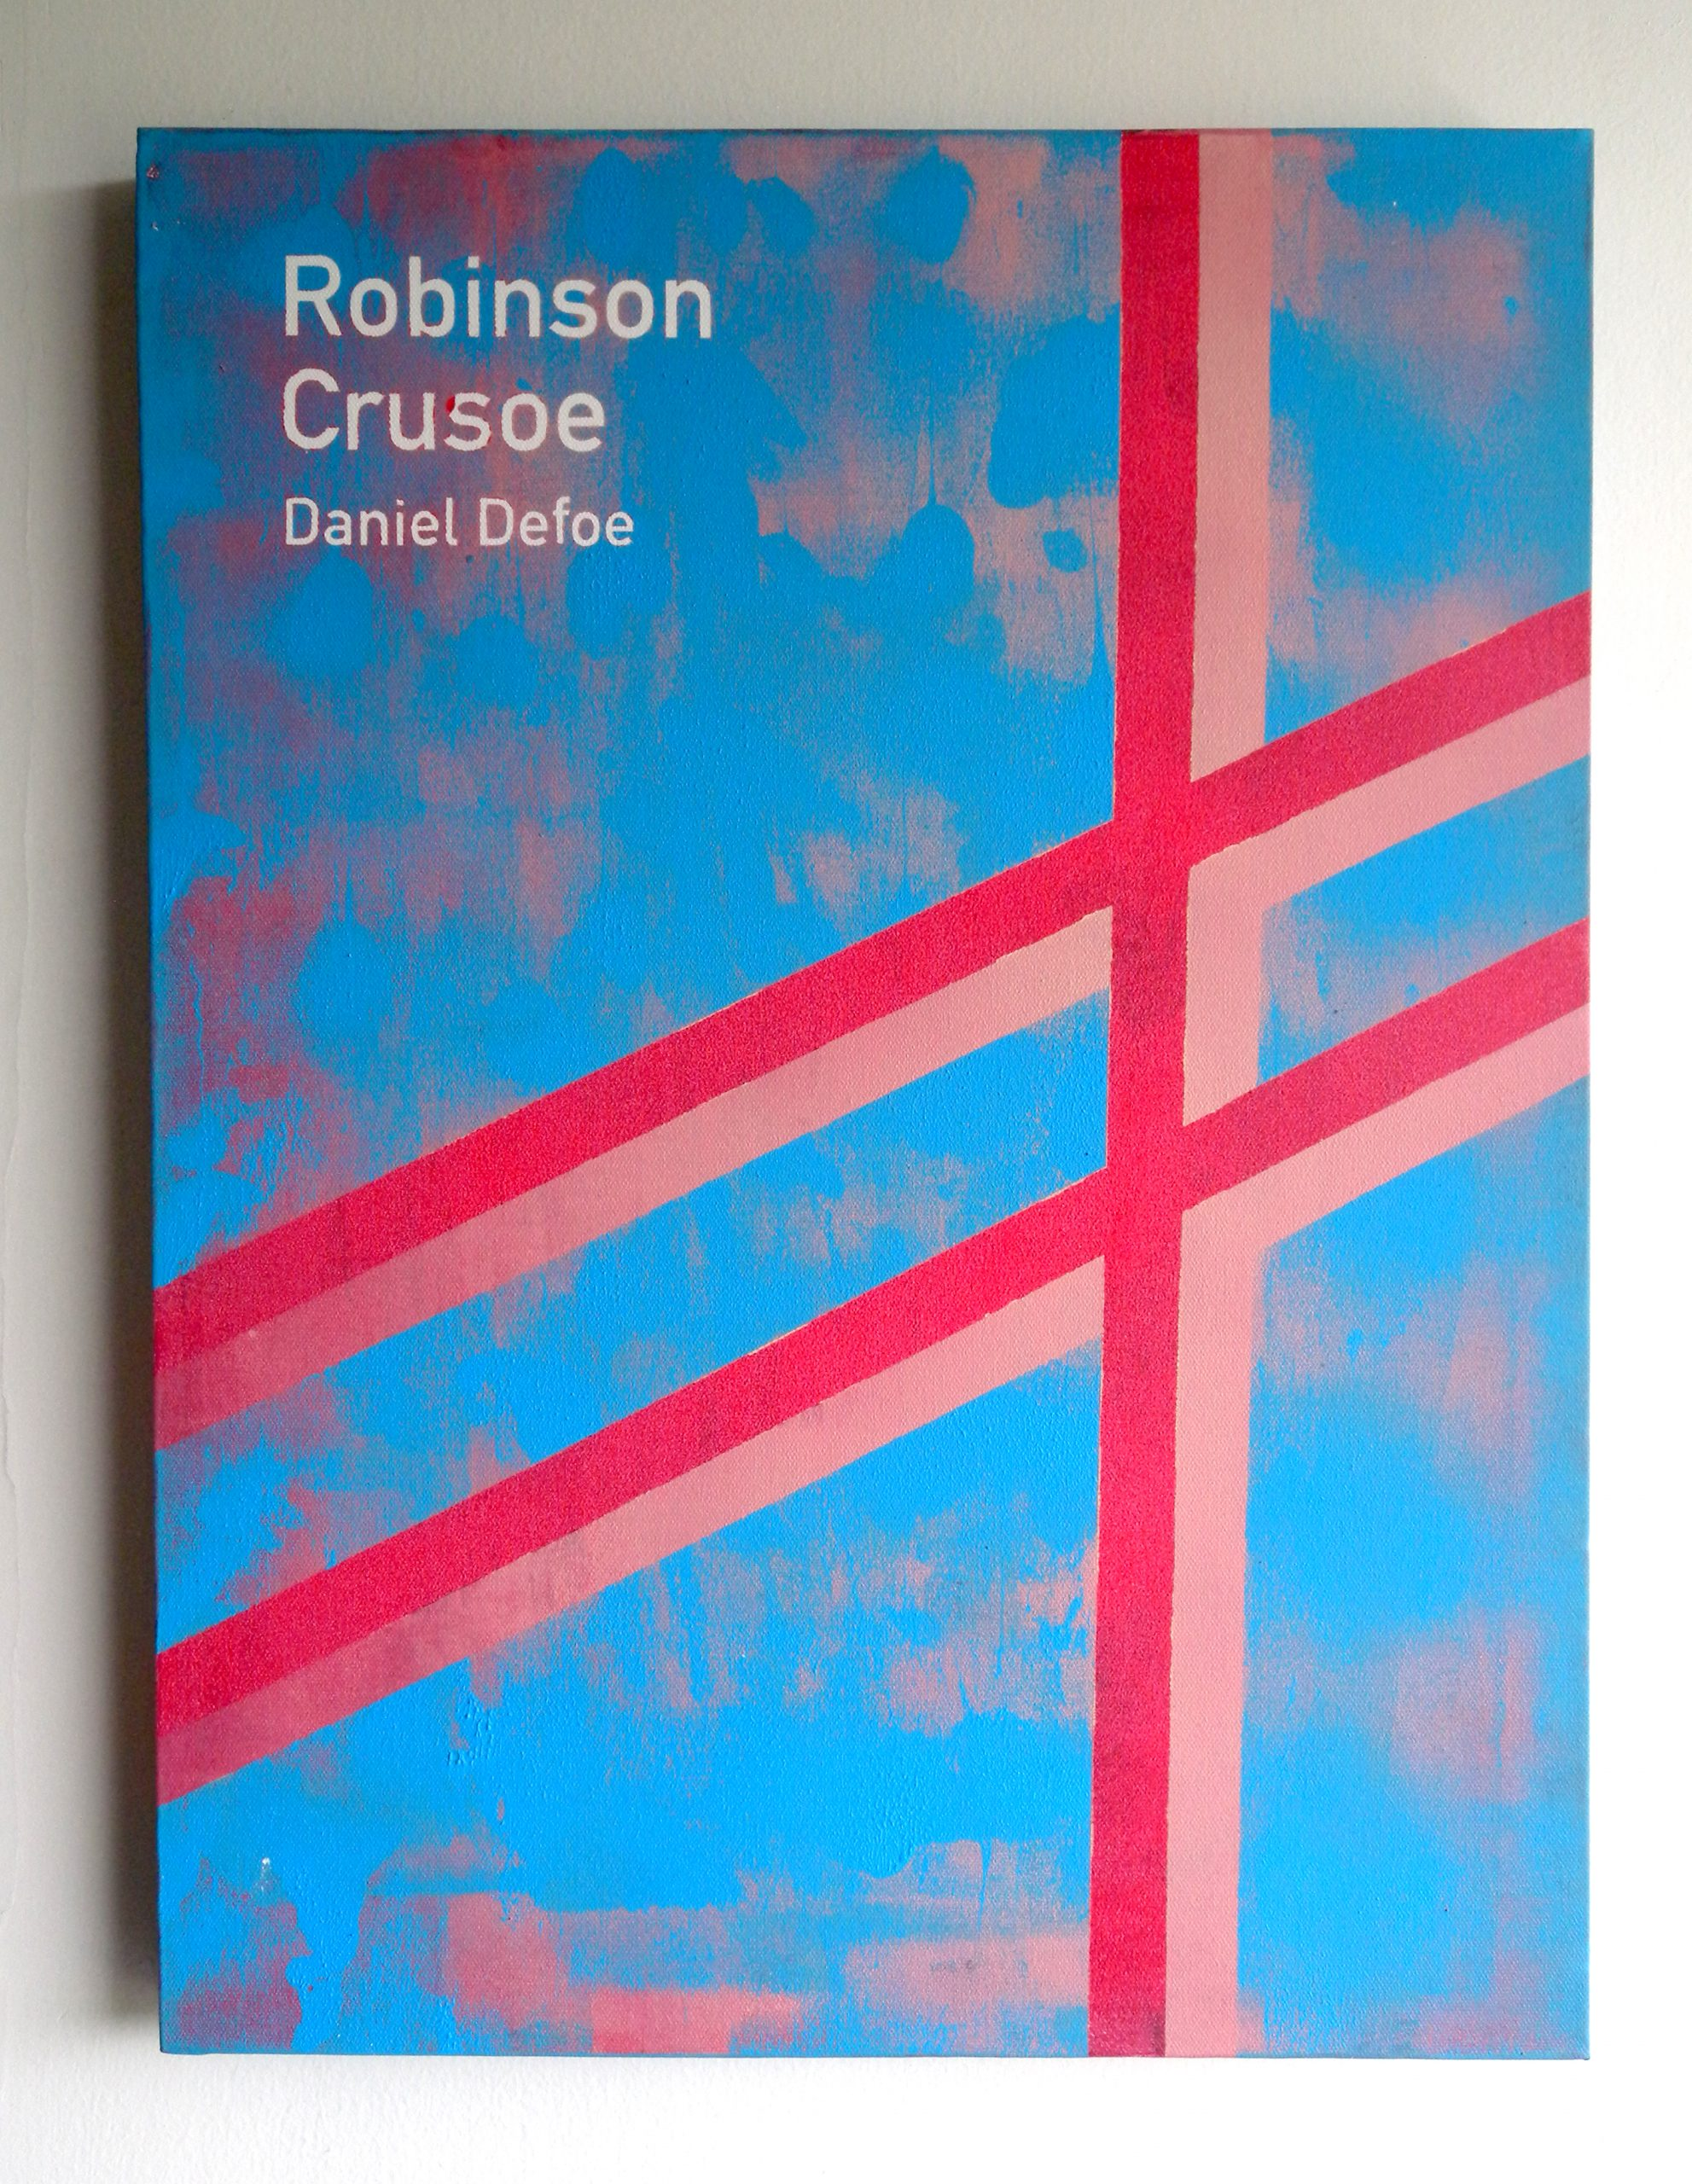 Robinson Crusoe / Daniel Defoe (3)